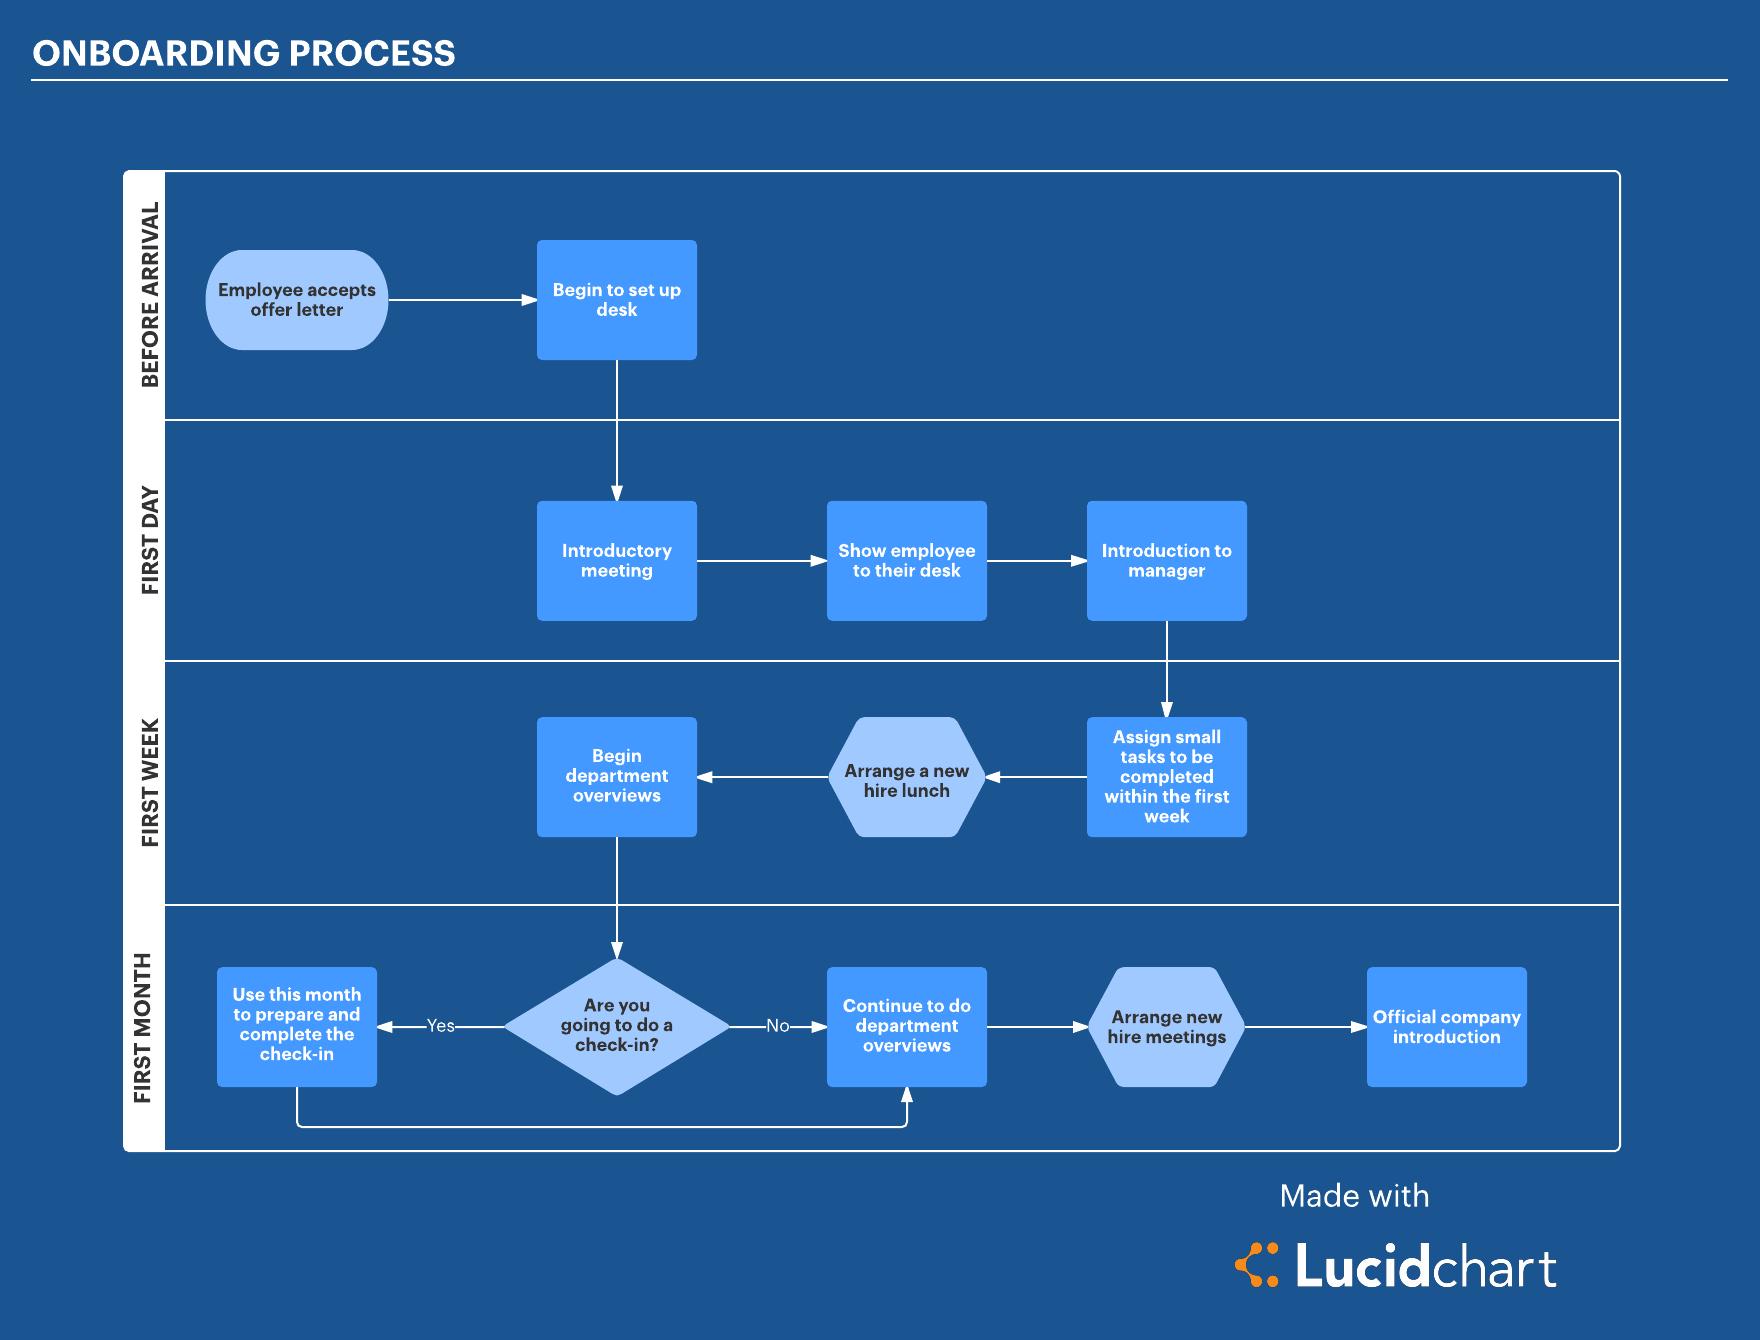 22 Best Sample Of Onboarding Workflow Diagram Samples Http Bookingritzcarlton Info 22 Best Sample Of Onboa Onboarding Process Onboarding Employee Onboarding